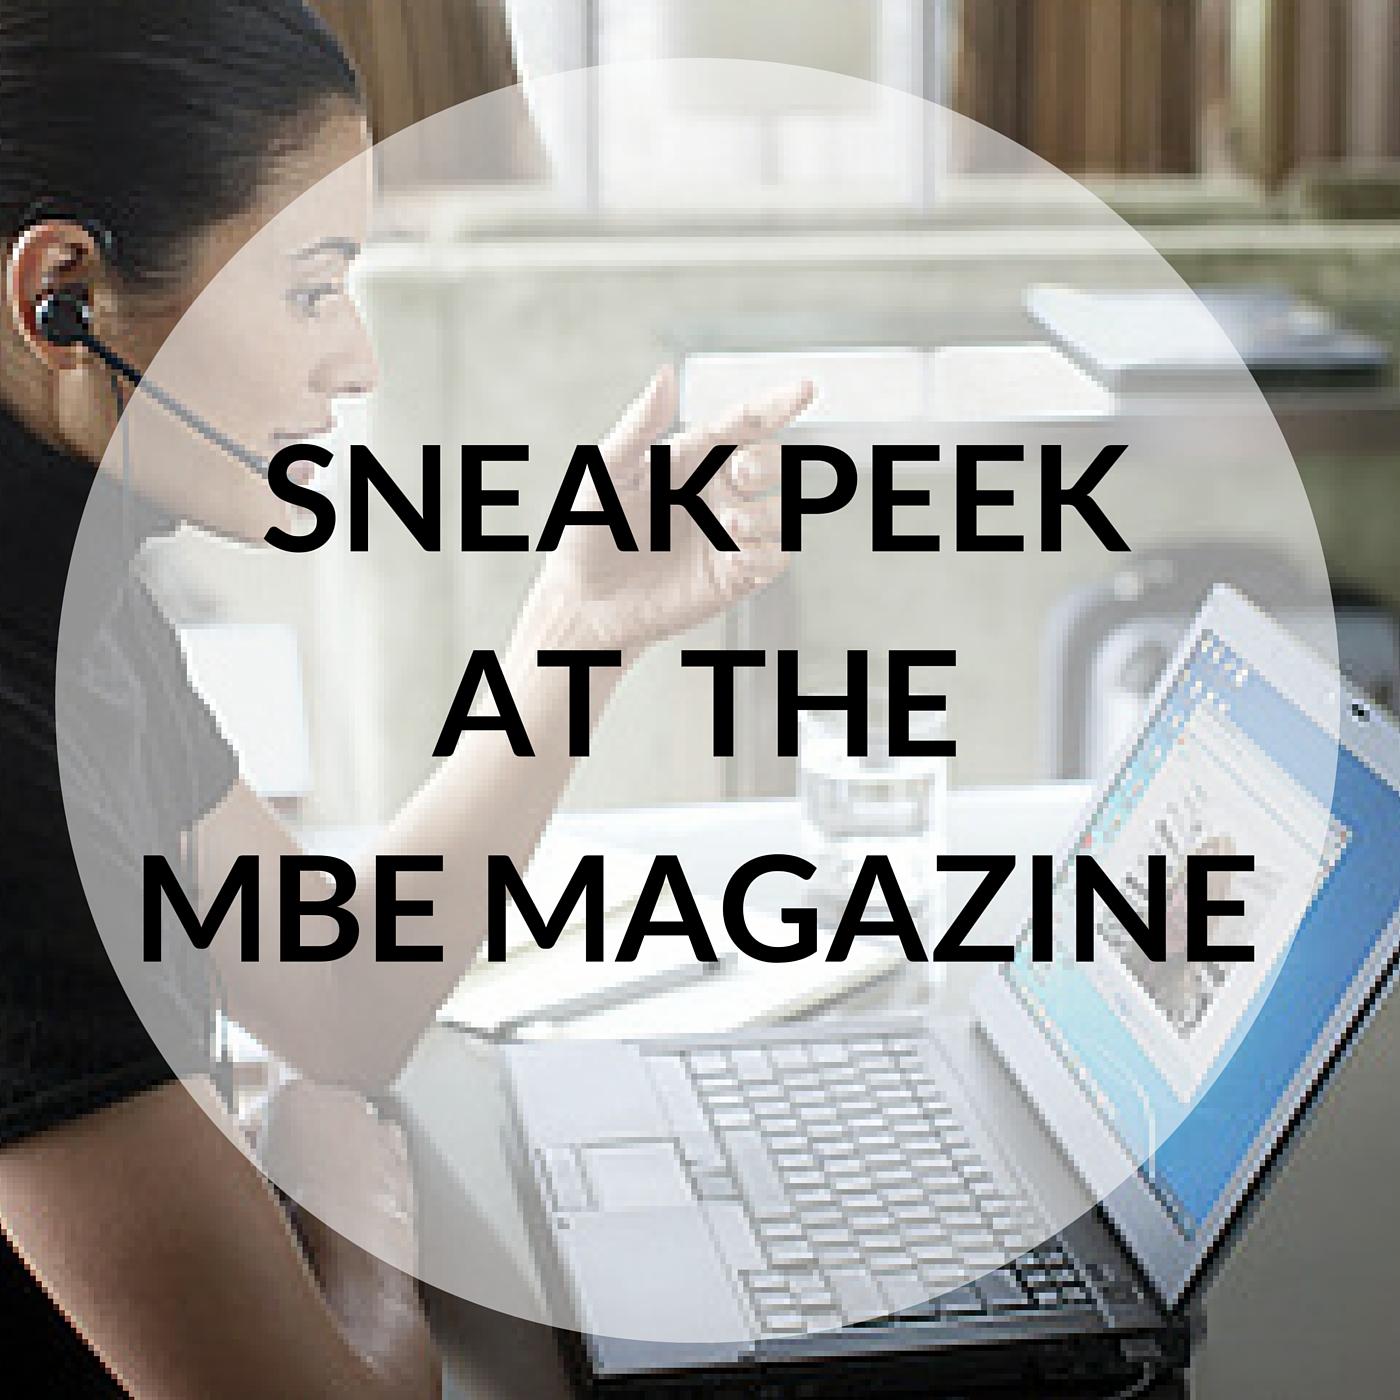 Sneak Peek MBE magazine, Minority Business Entrepreneur, Lisa Siragusa Interview, WBE Canada, Breakfast with Brands